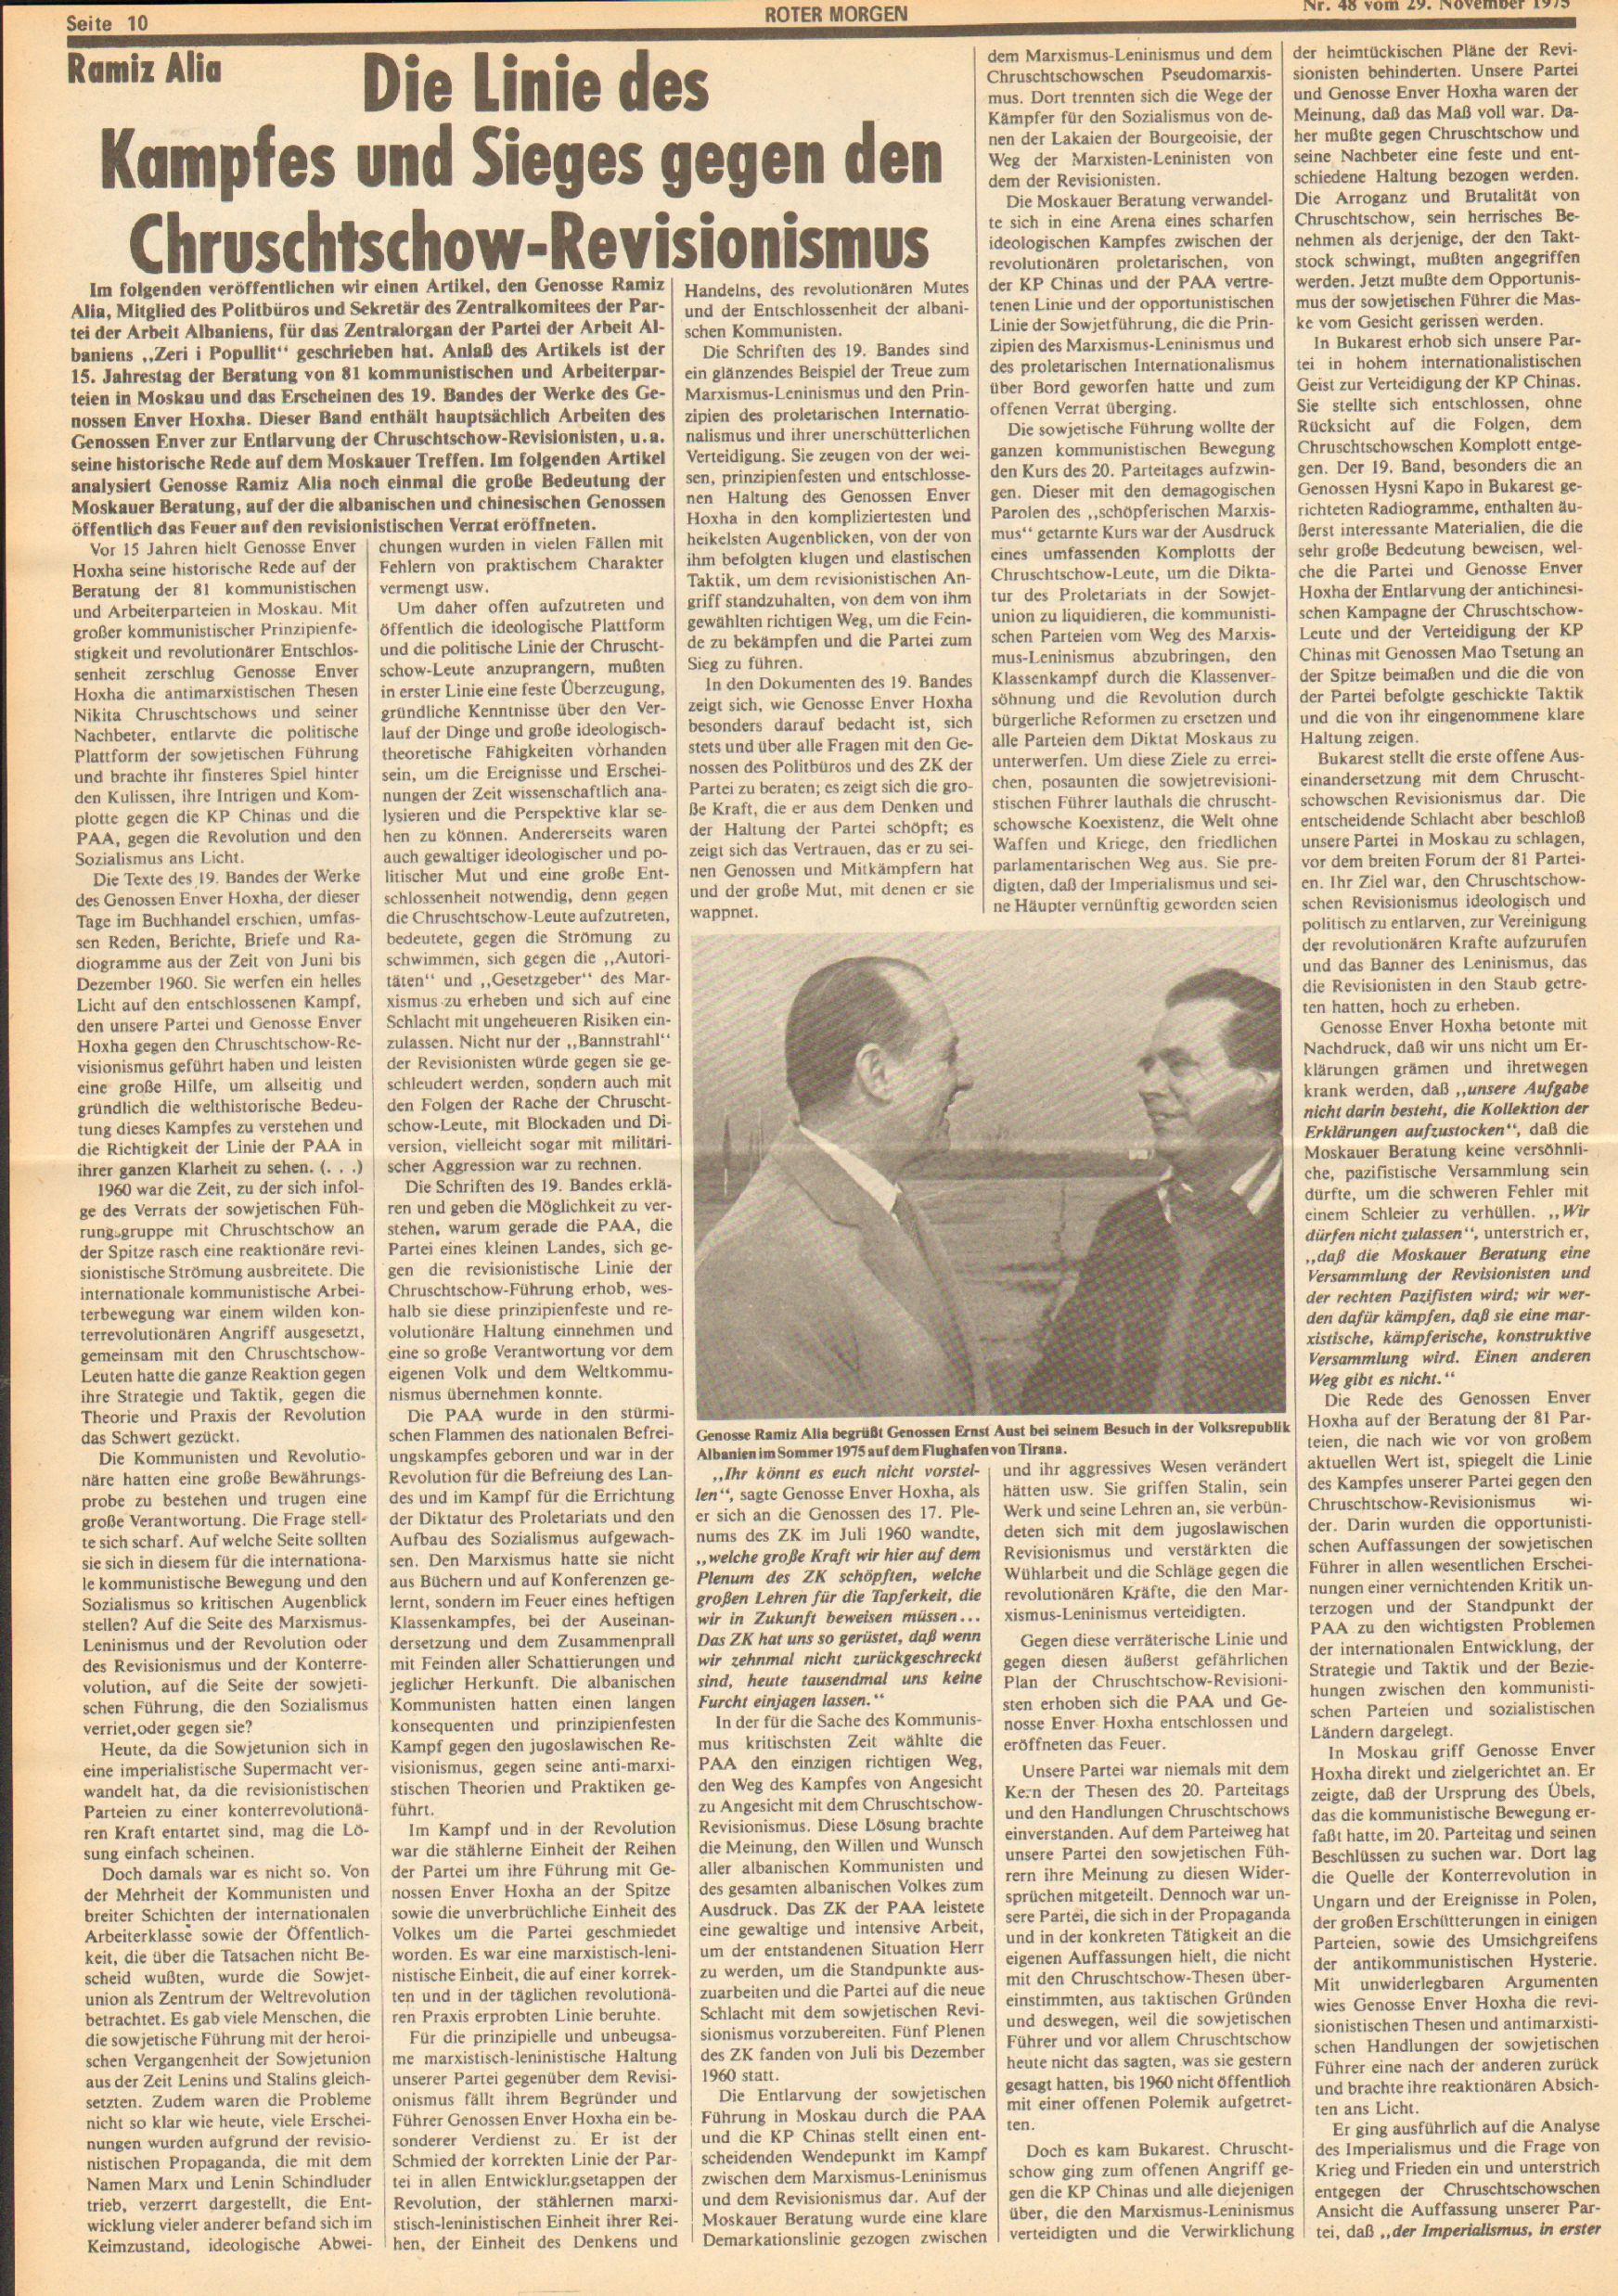 Roter Morgen, 9. Jg., 29. November 1975, Nr. 48, Seite 10